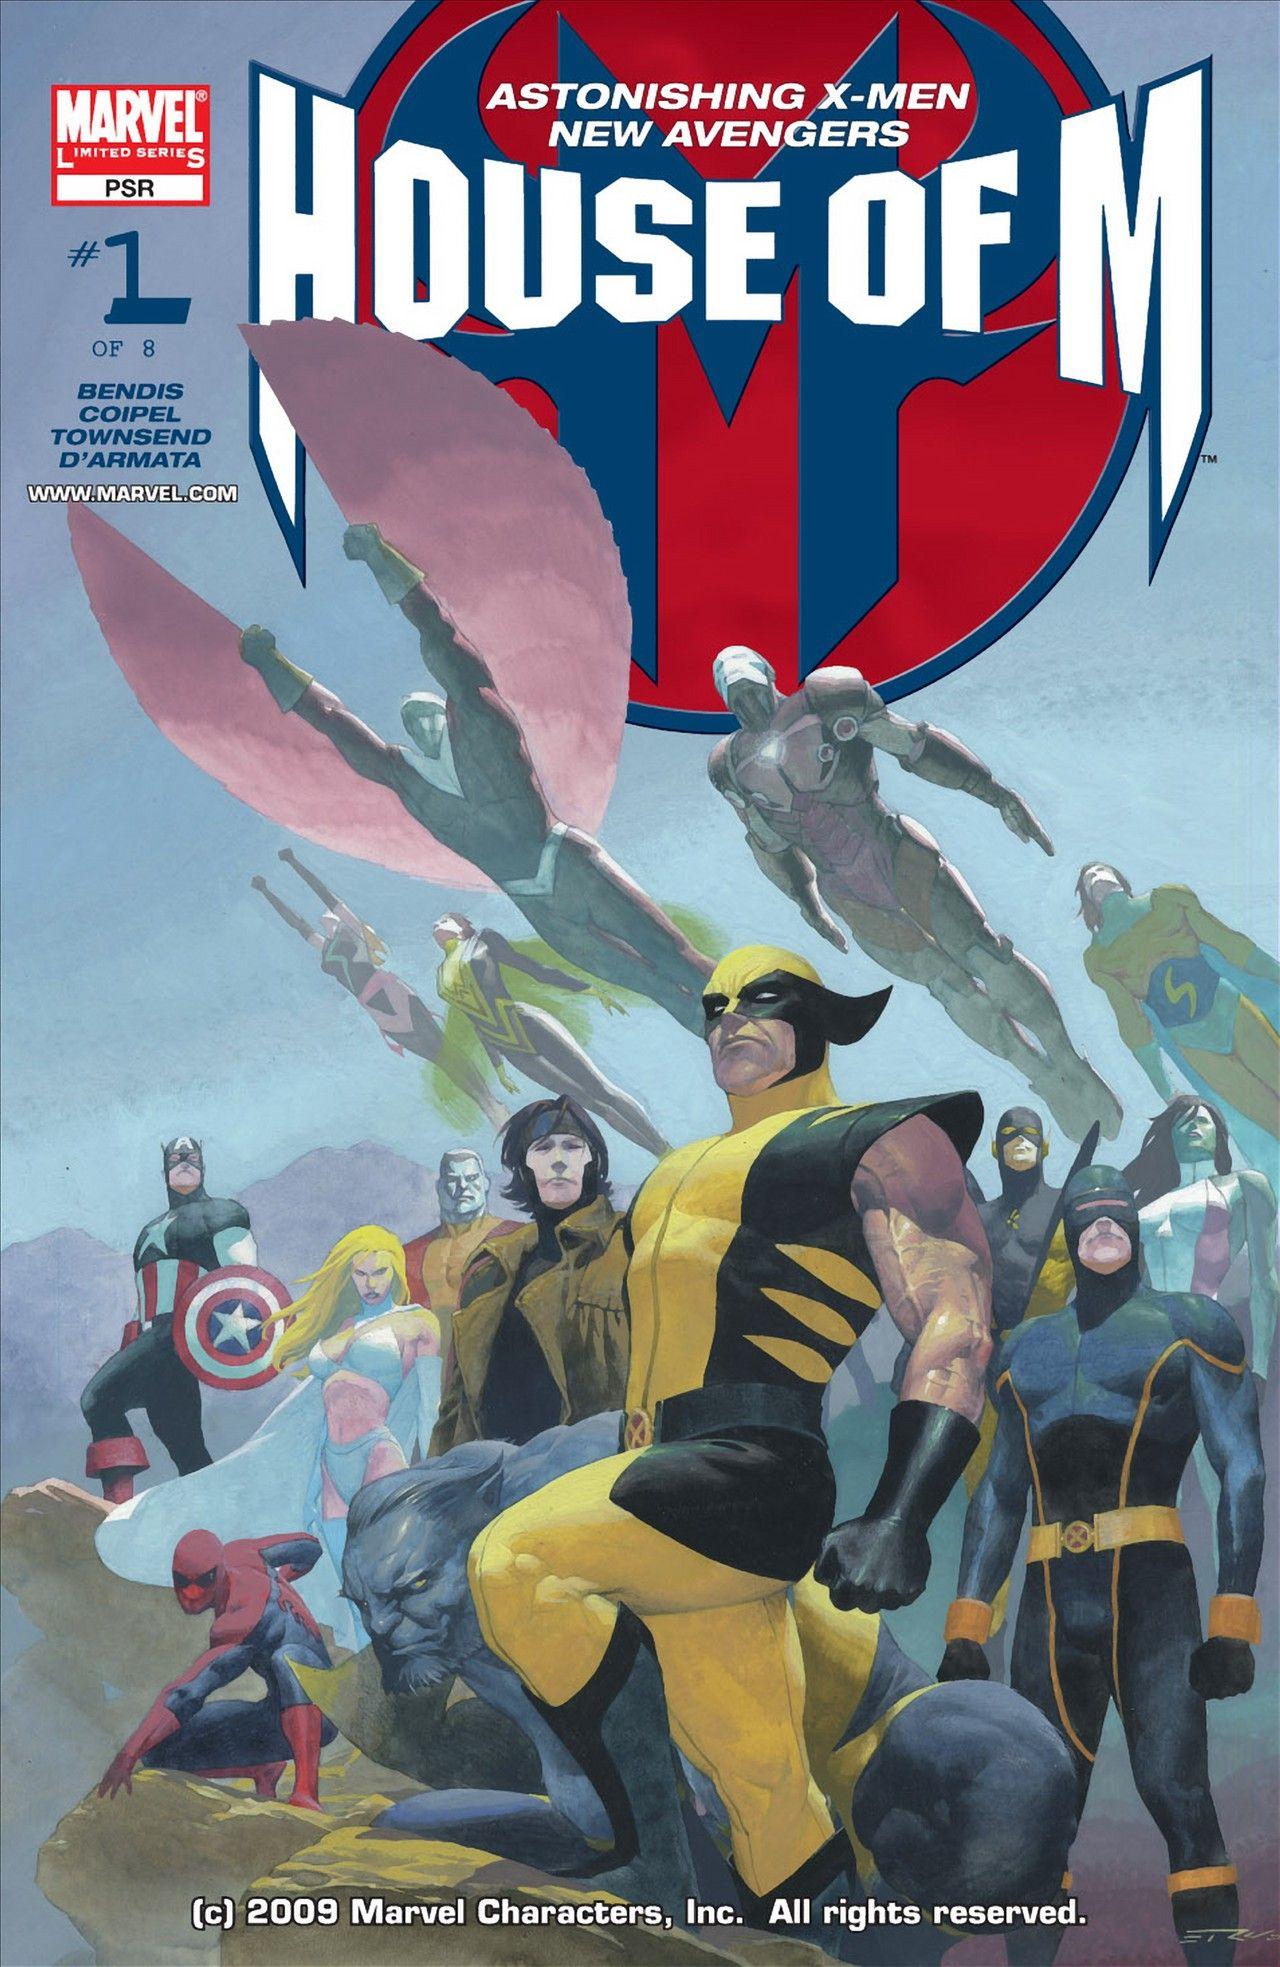 Pin By Lynn Lott On Comic X Men Marvel Events X Men Marvel Comic Books